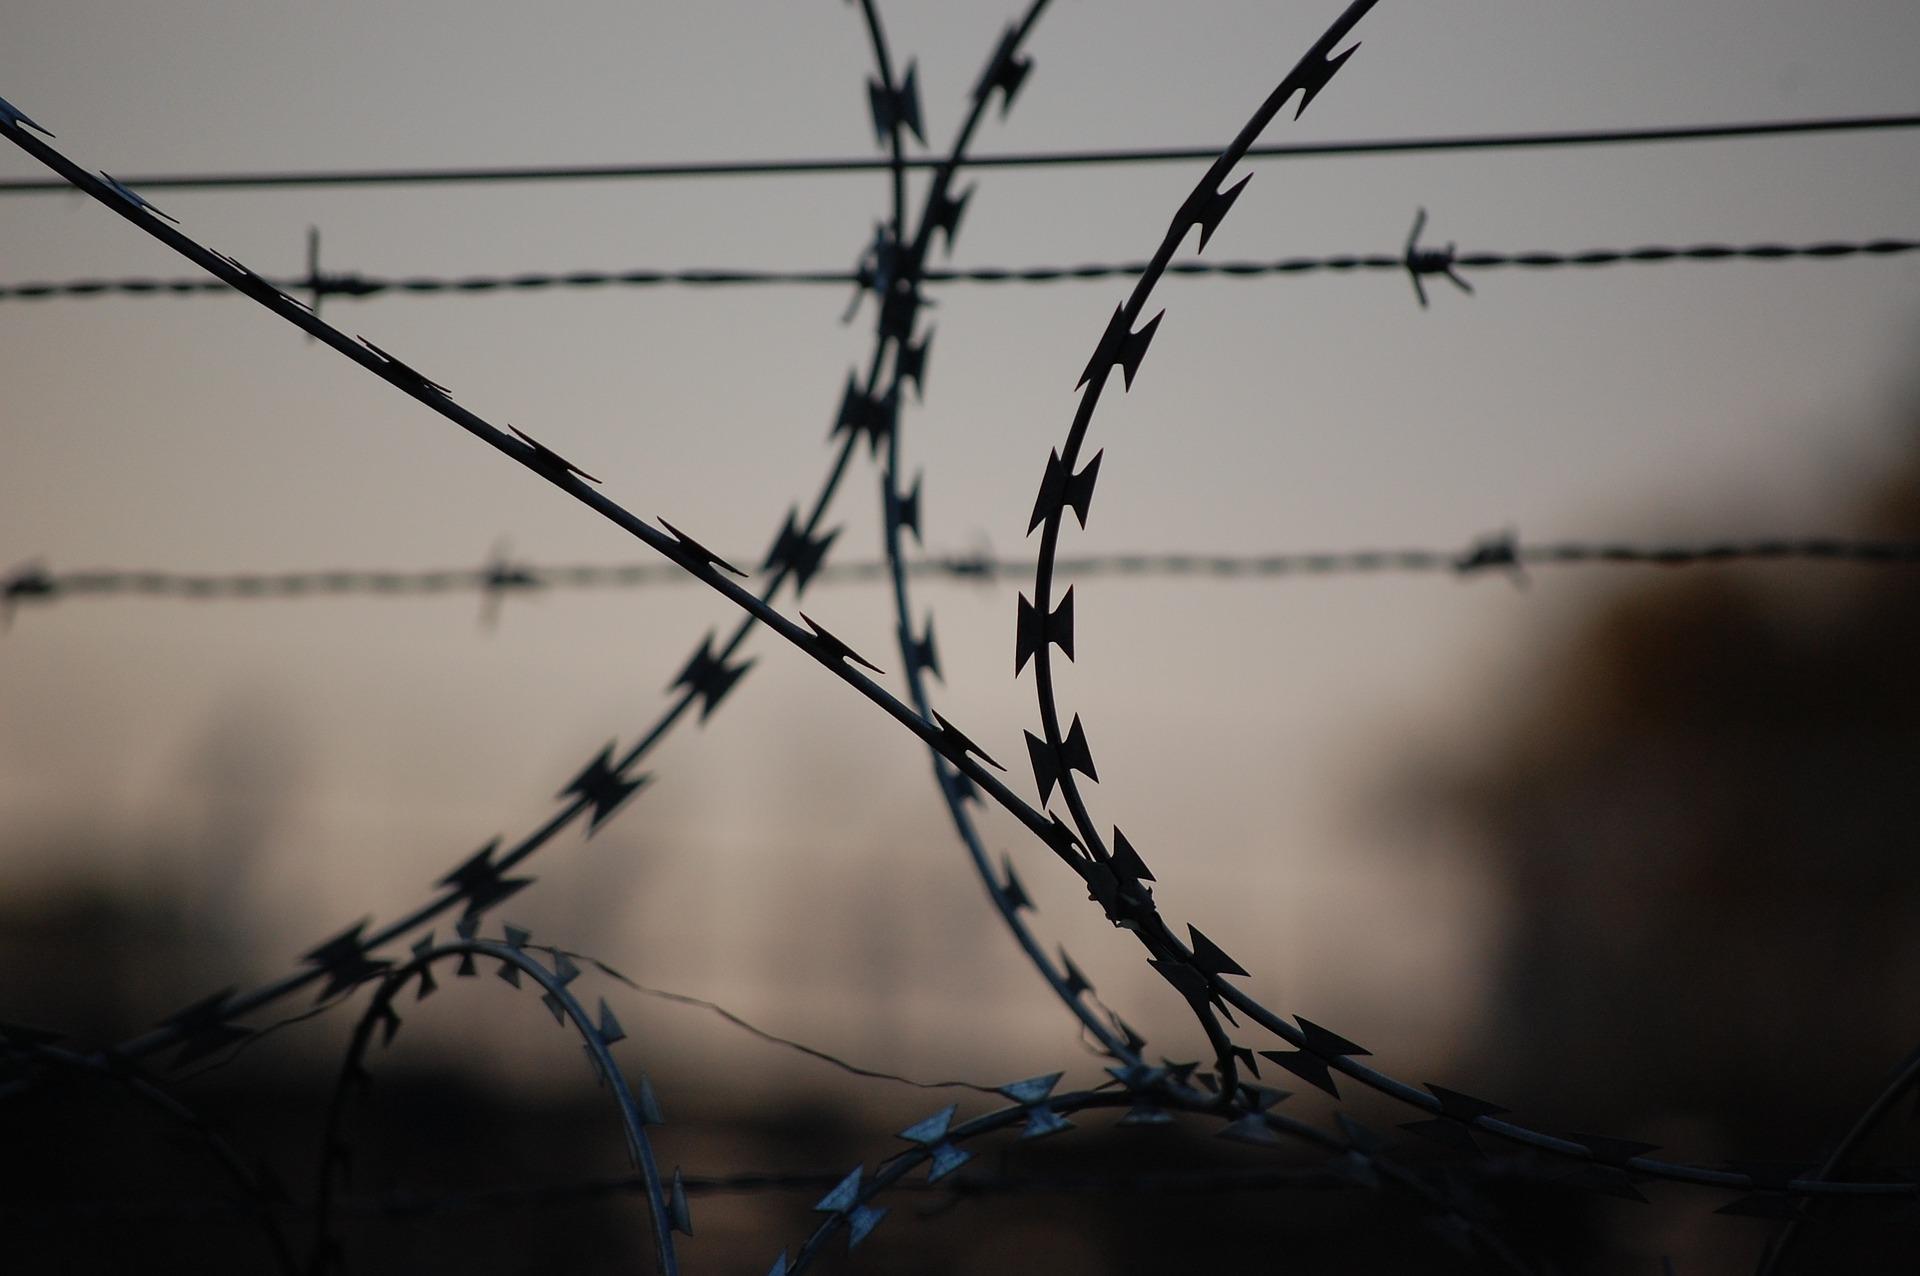 Heroin Withdrawal Prison Deaths